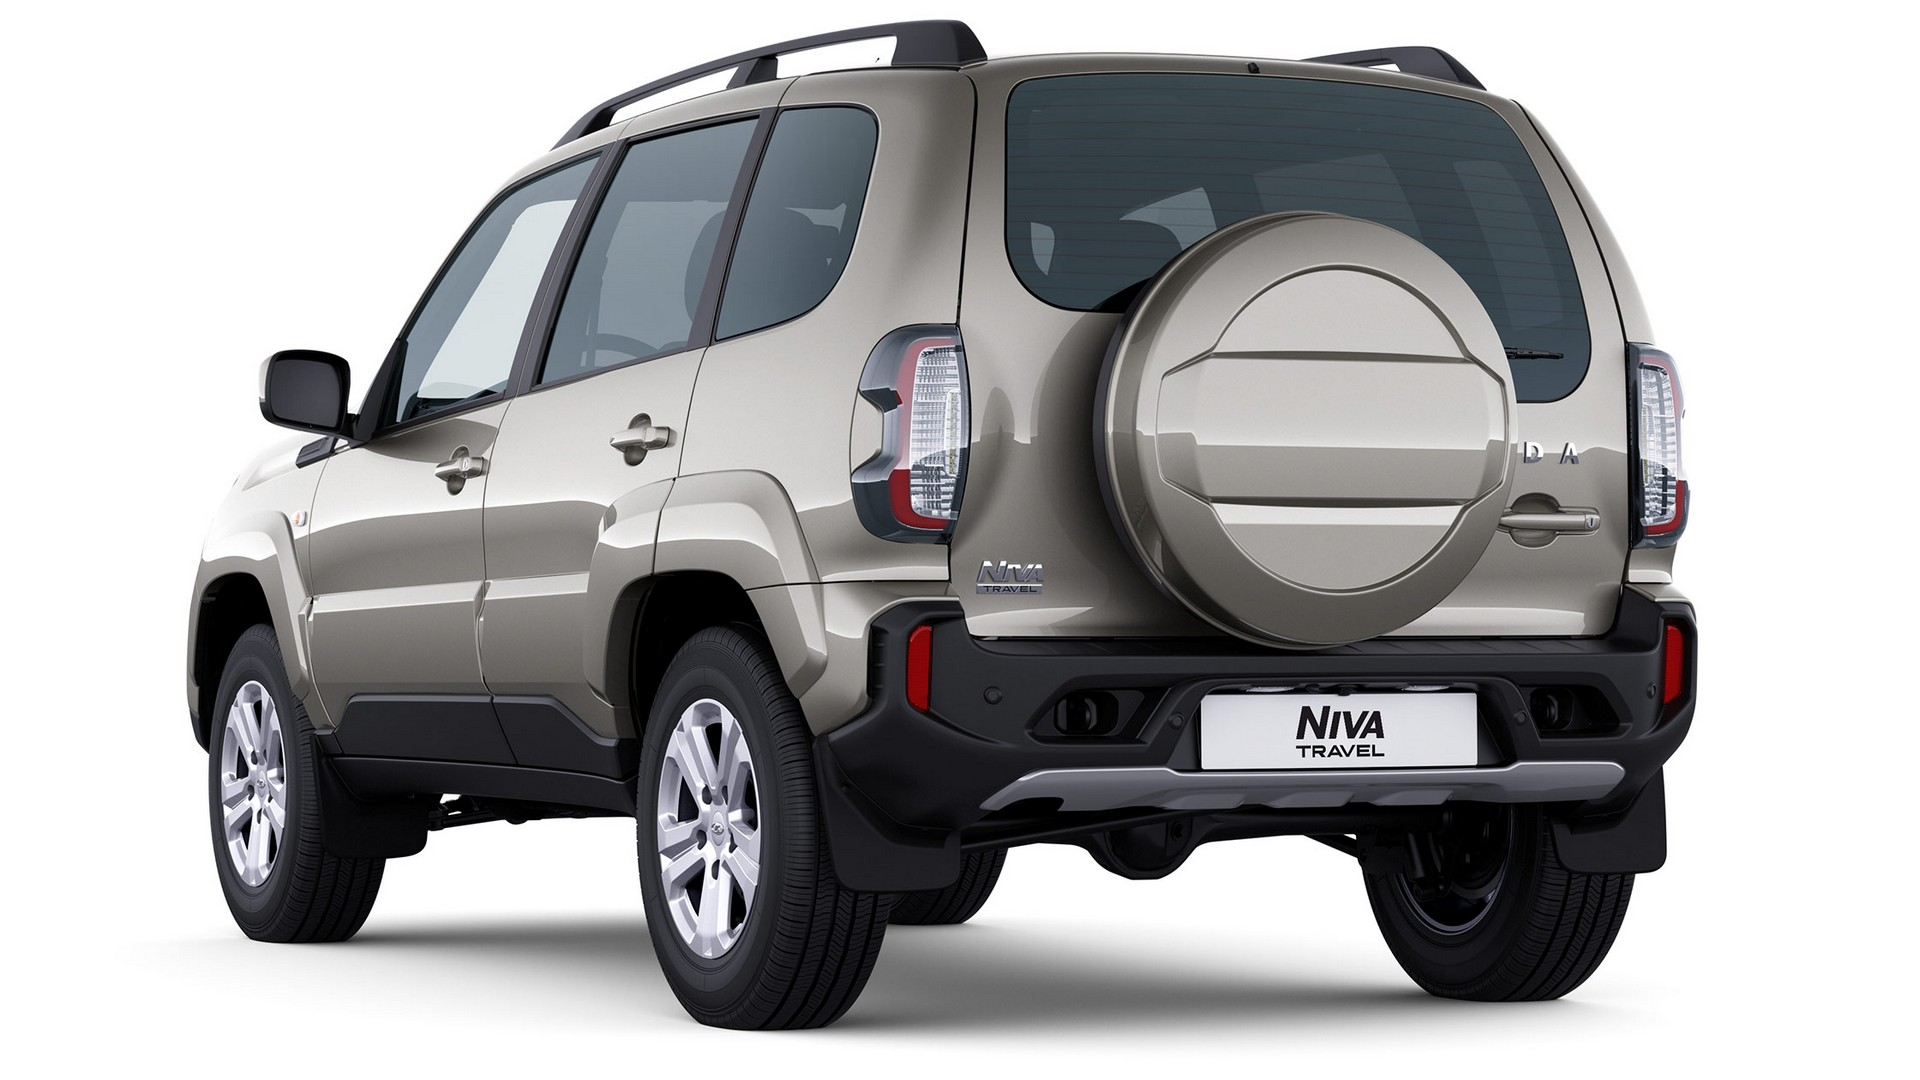 Lada Niva Travel